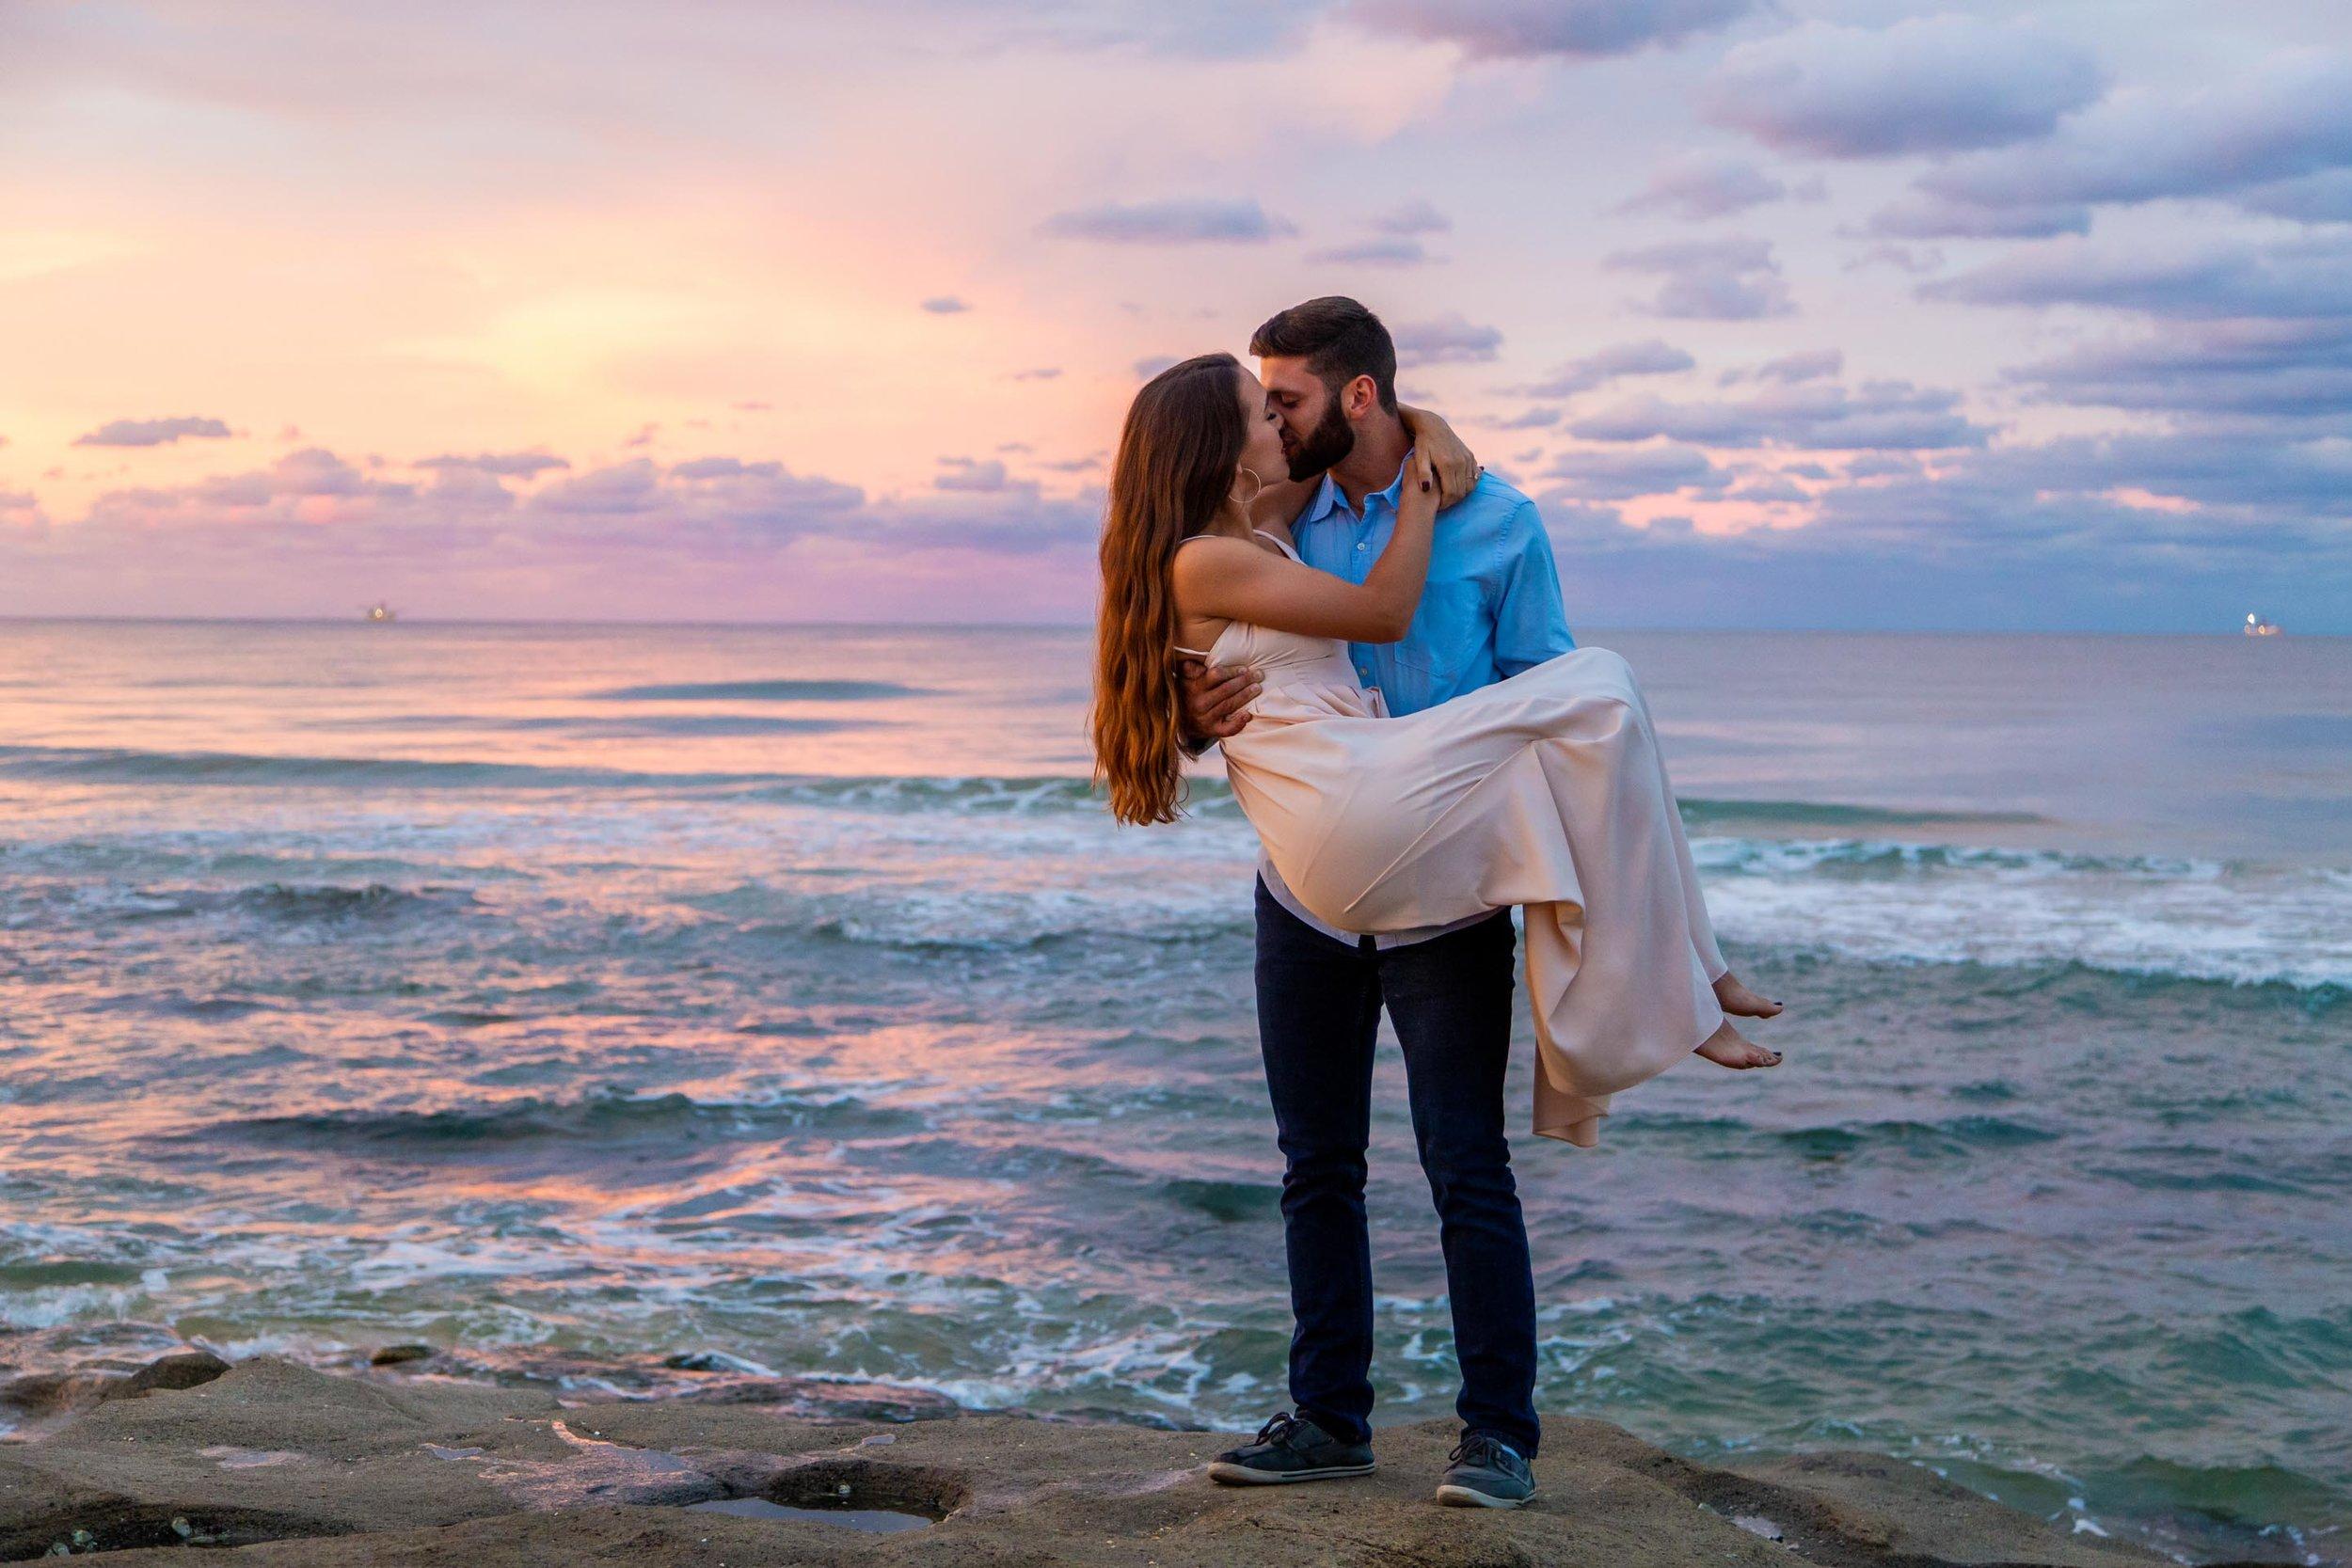 adam-szarmack-jacksonville-wedding-photographer-palm-coast-washing-oaks-garden-state-park-engagement-62.jpg